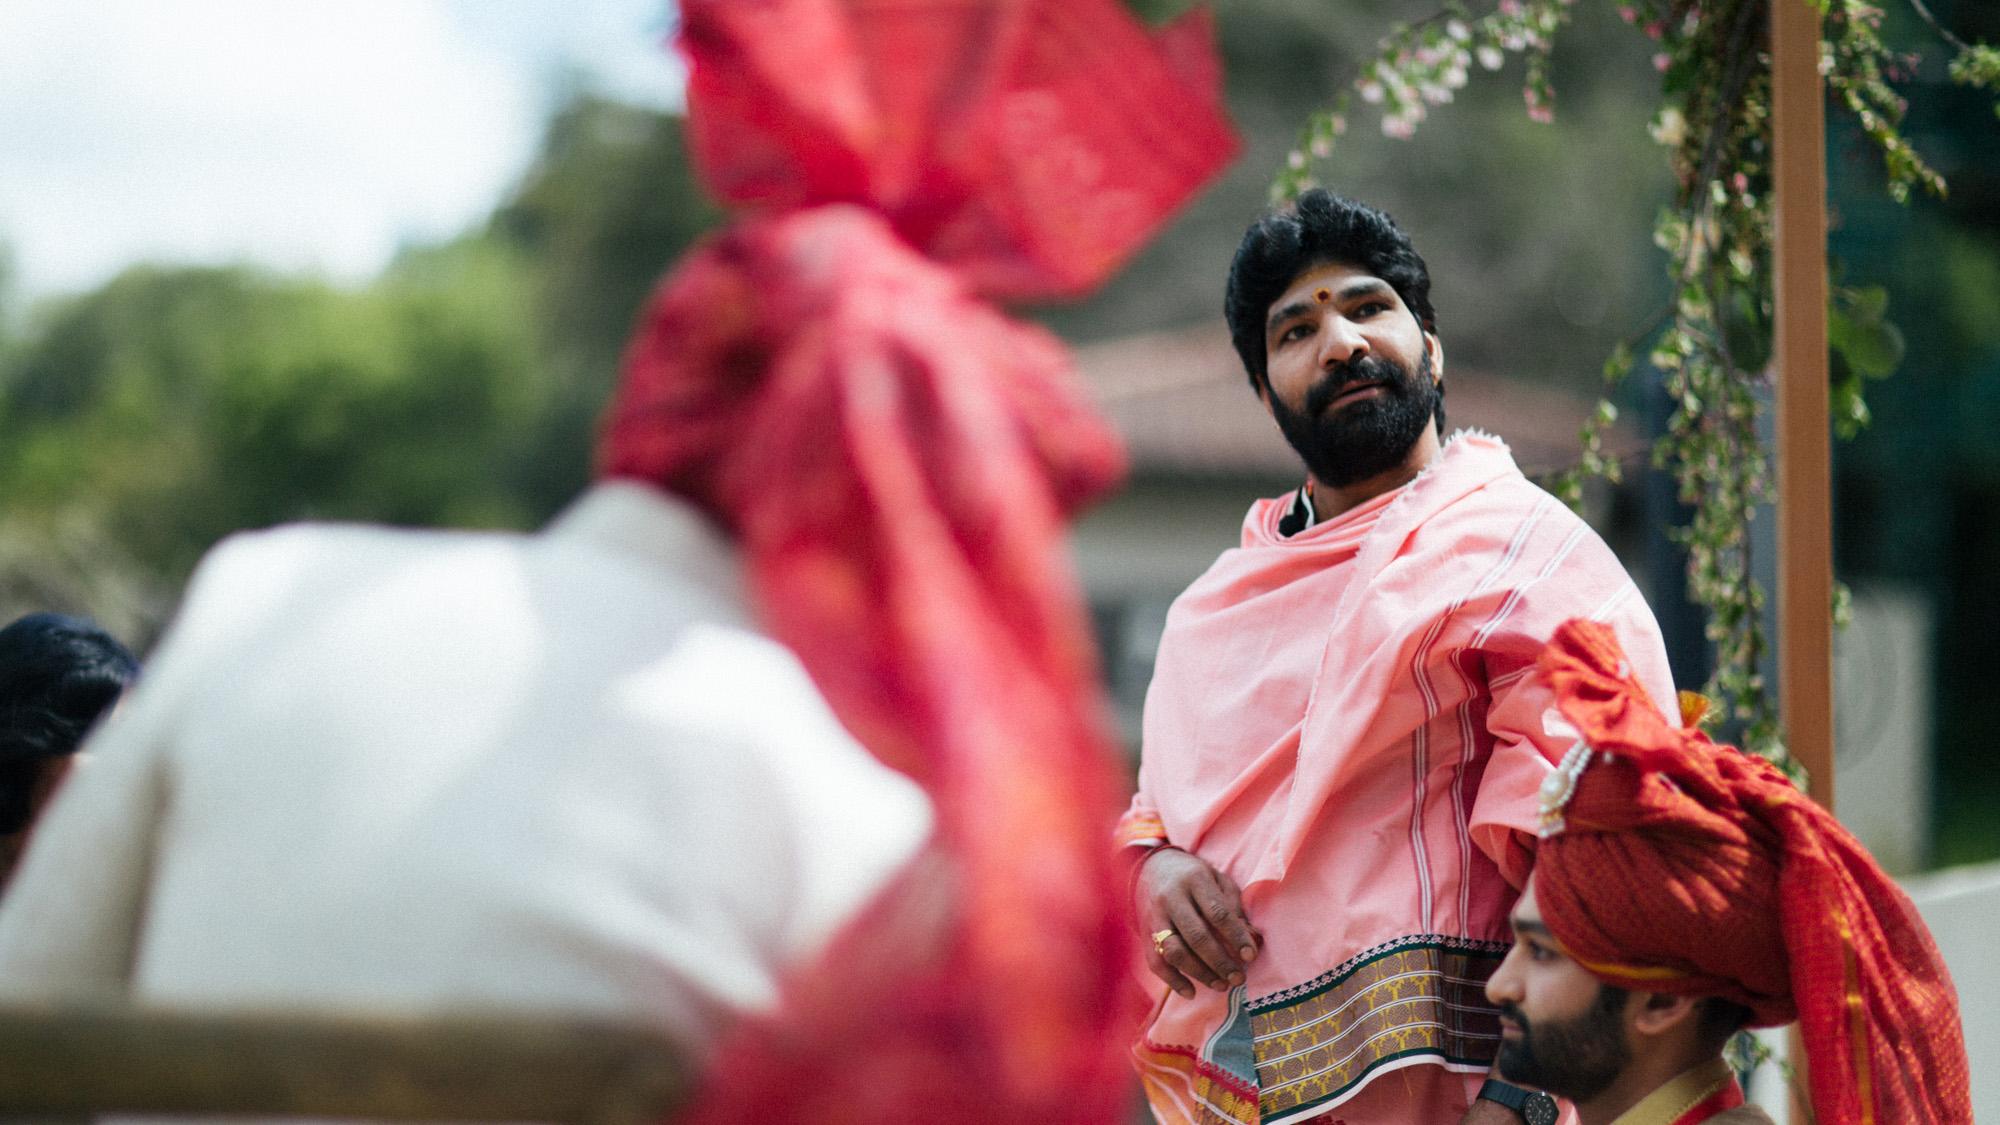 anu_maneesh_alec_vanderboom_Indian_wedding_photography-0090.jpg